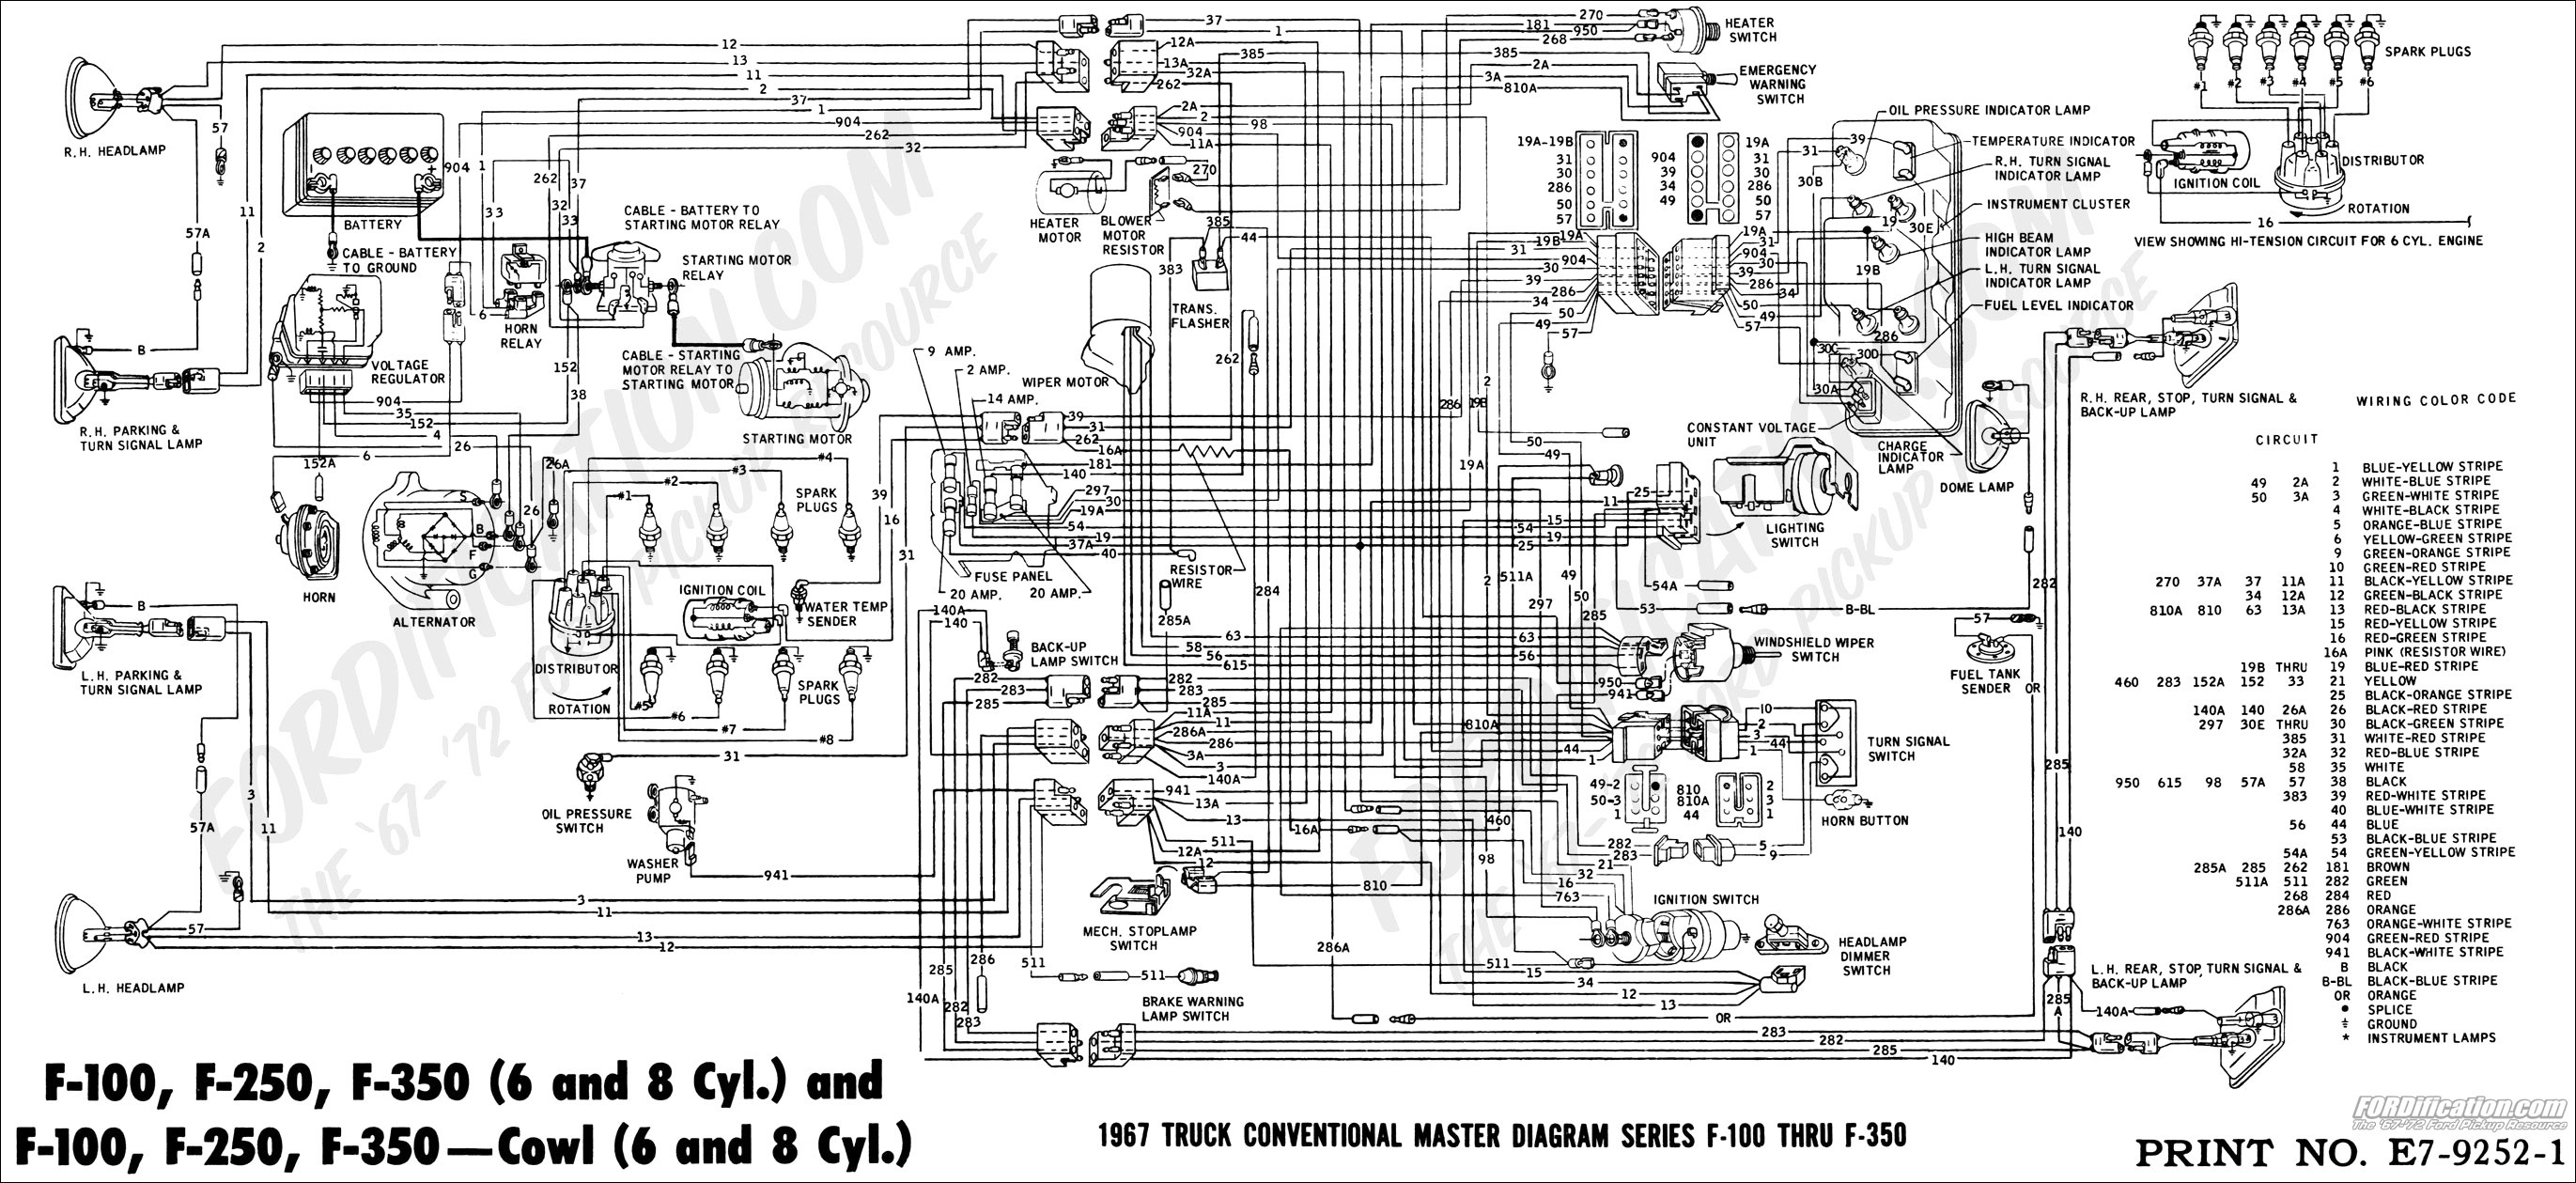 2000 ford F150 Wiring Diagram 1990 ford Wiring Diagram Wiring Diagram Of 2000 ford F150 Wiring Diagram